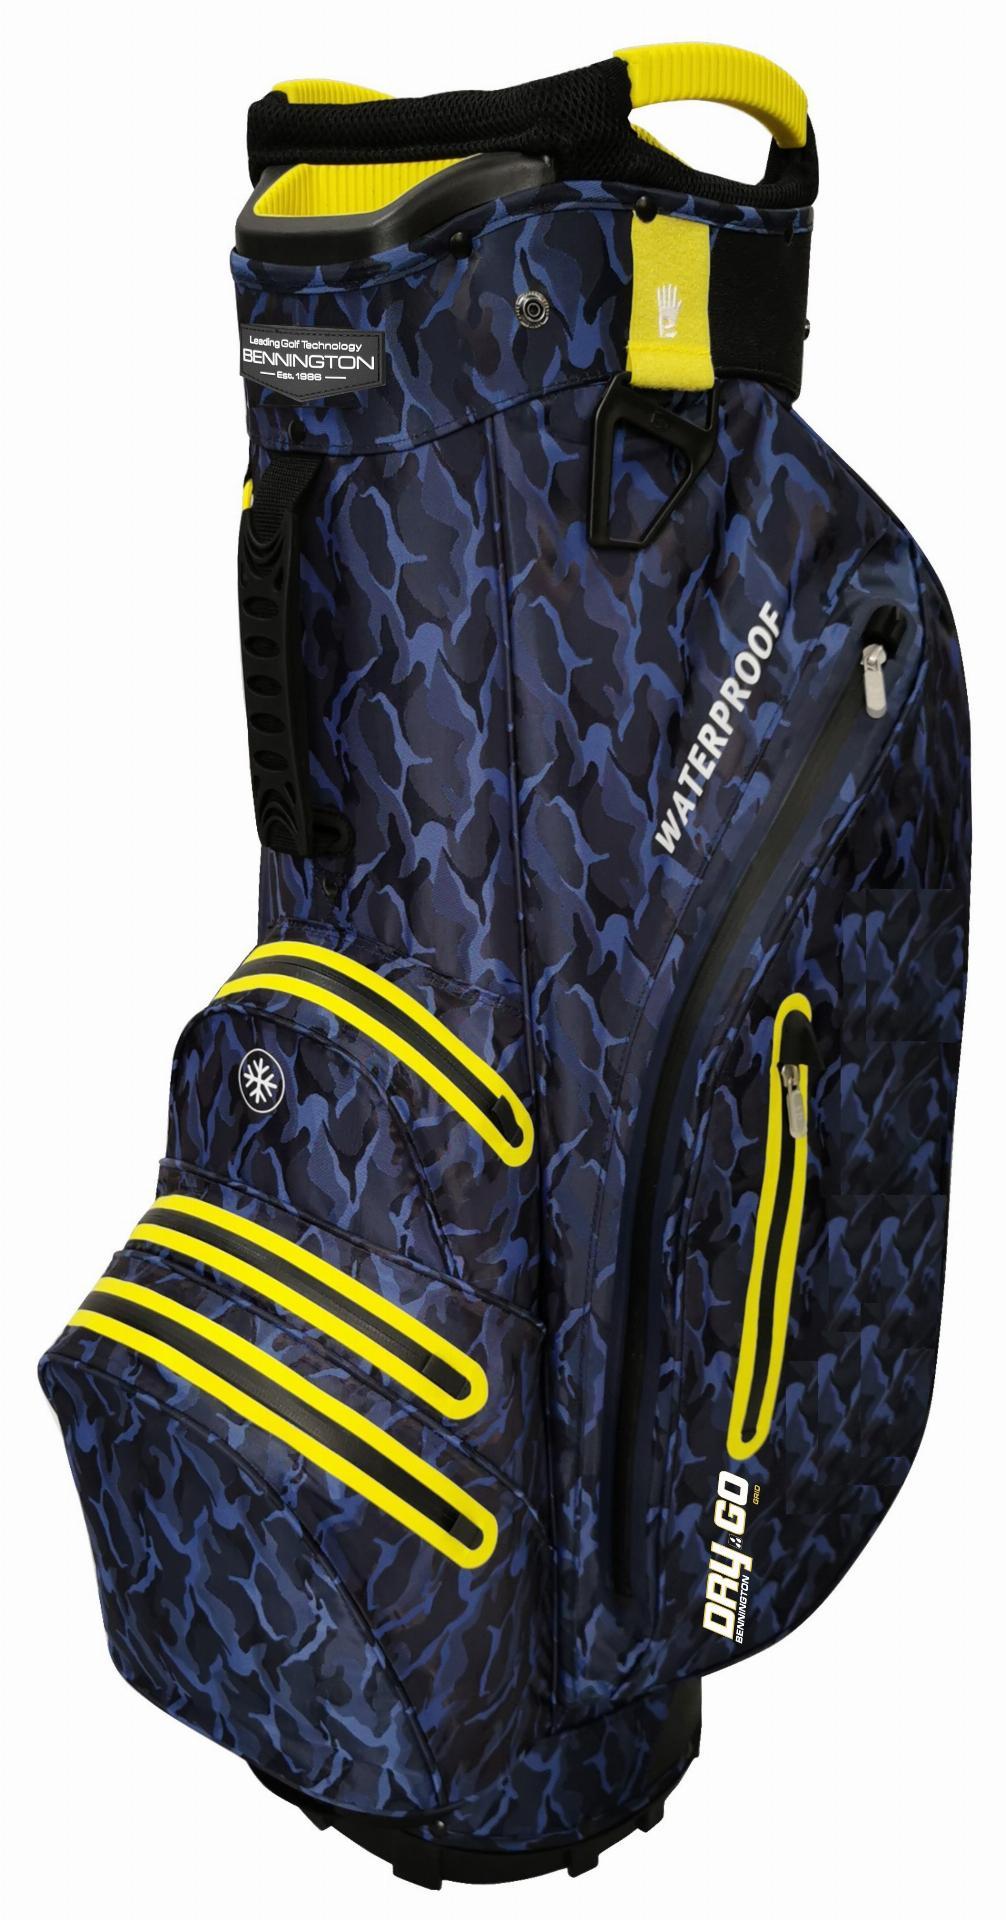 Dry 14 GO Waterproof Cartbag, blau-camo/gelb